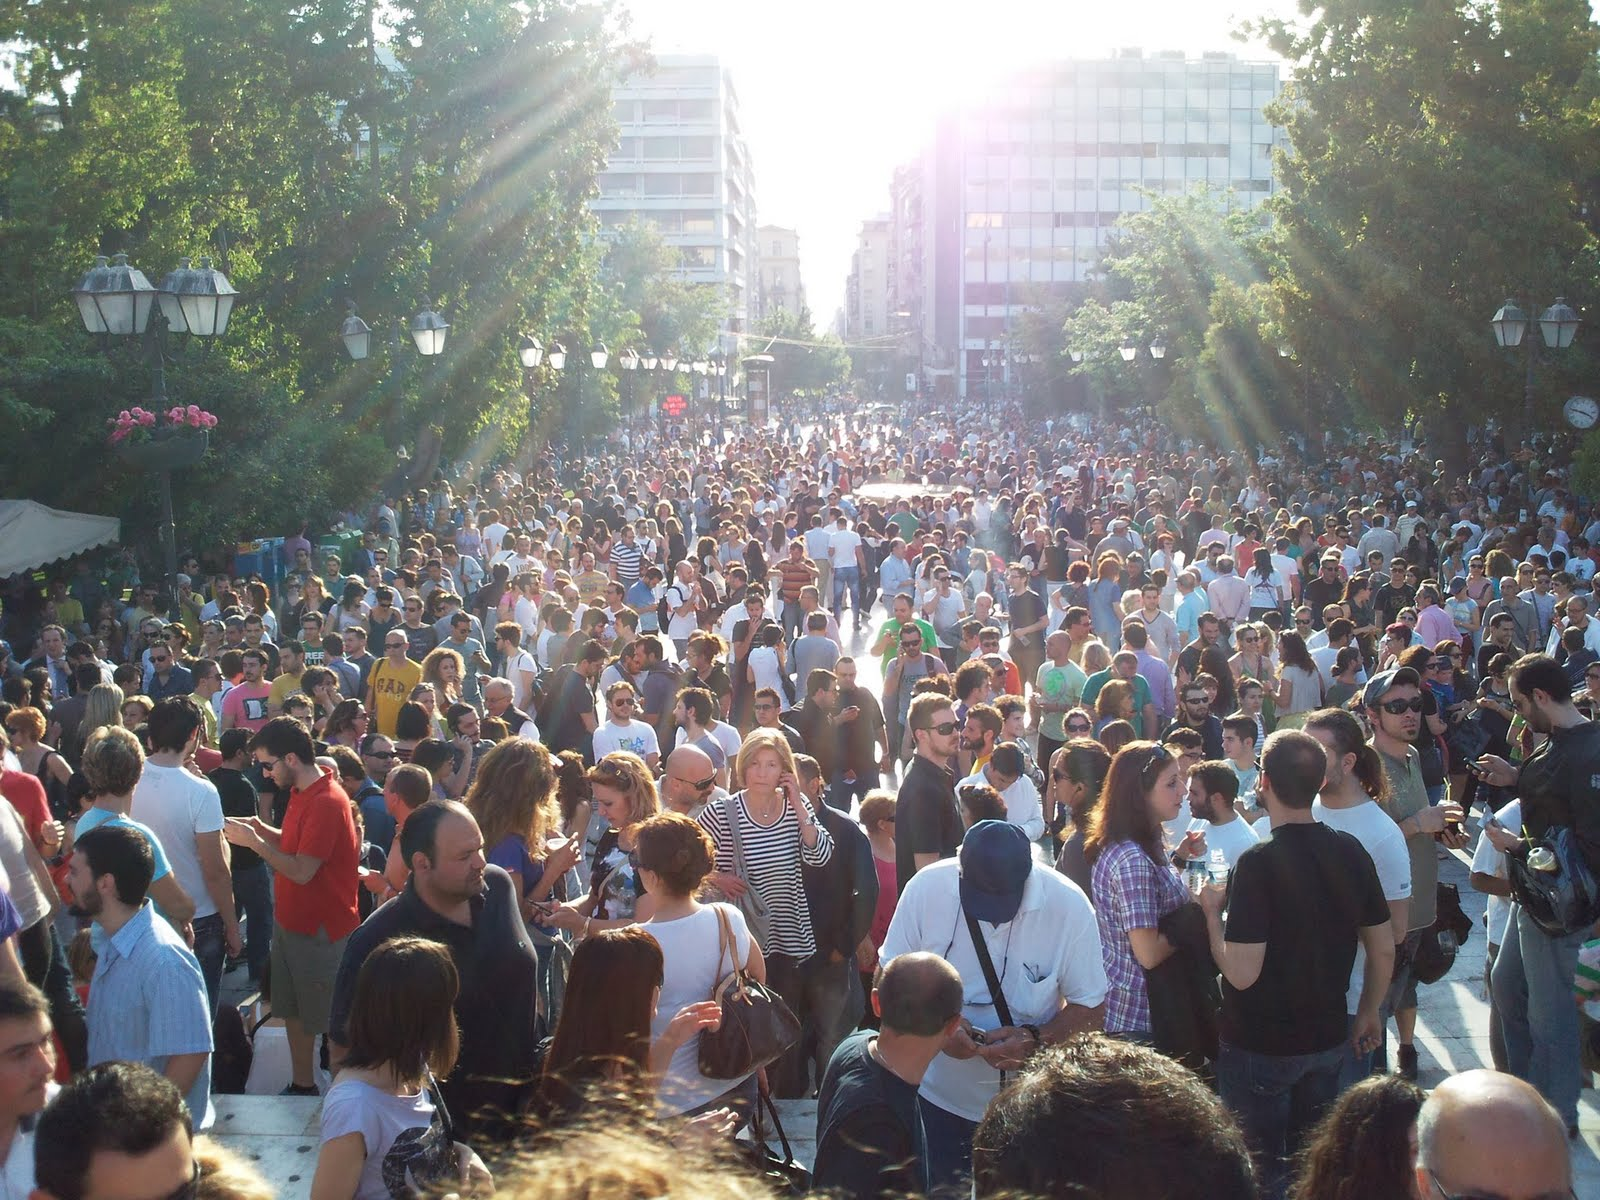 EUROVISION SONG CONTEST 2011!!! - Page 40 Syntagma-aganaktismenoi6